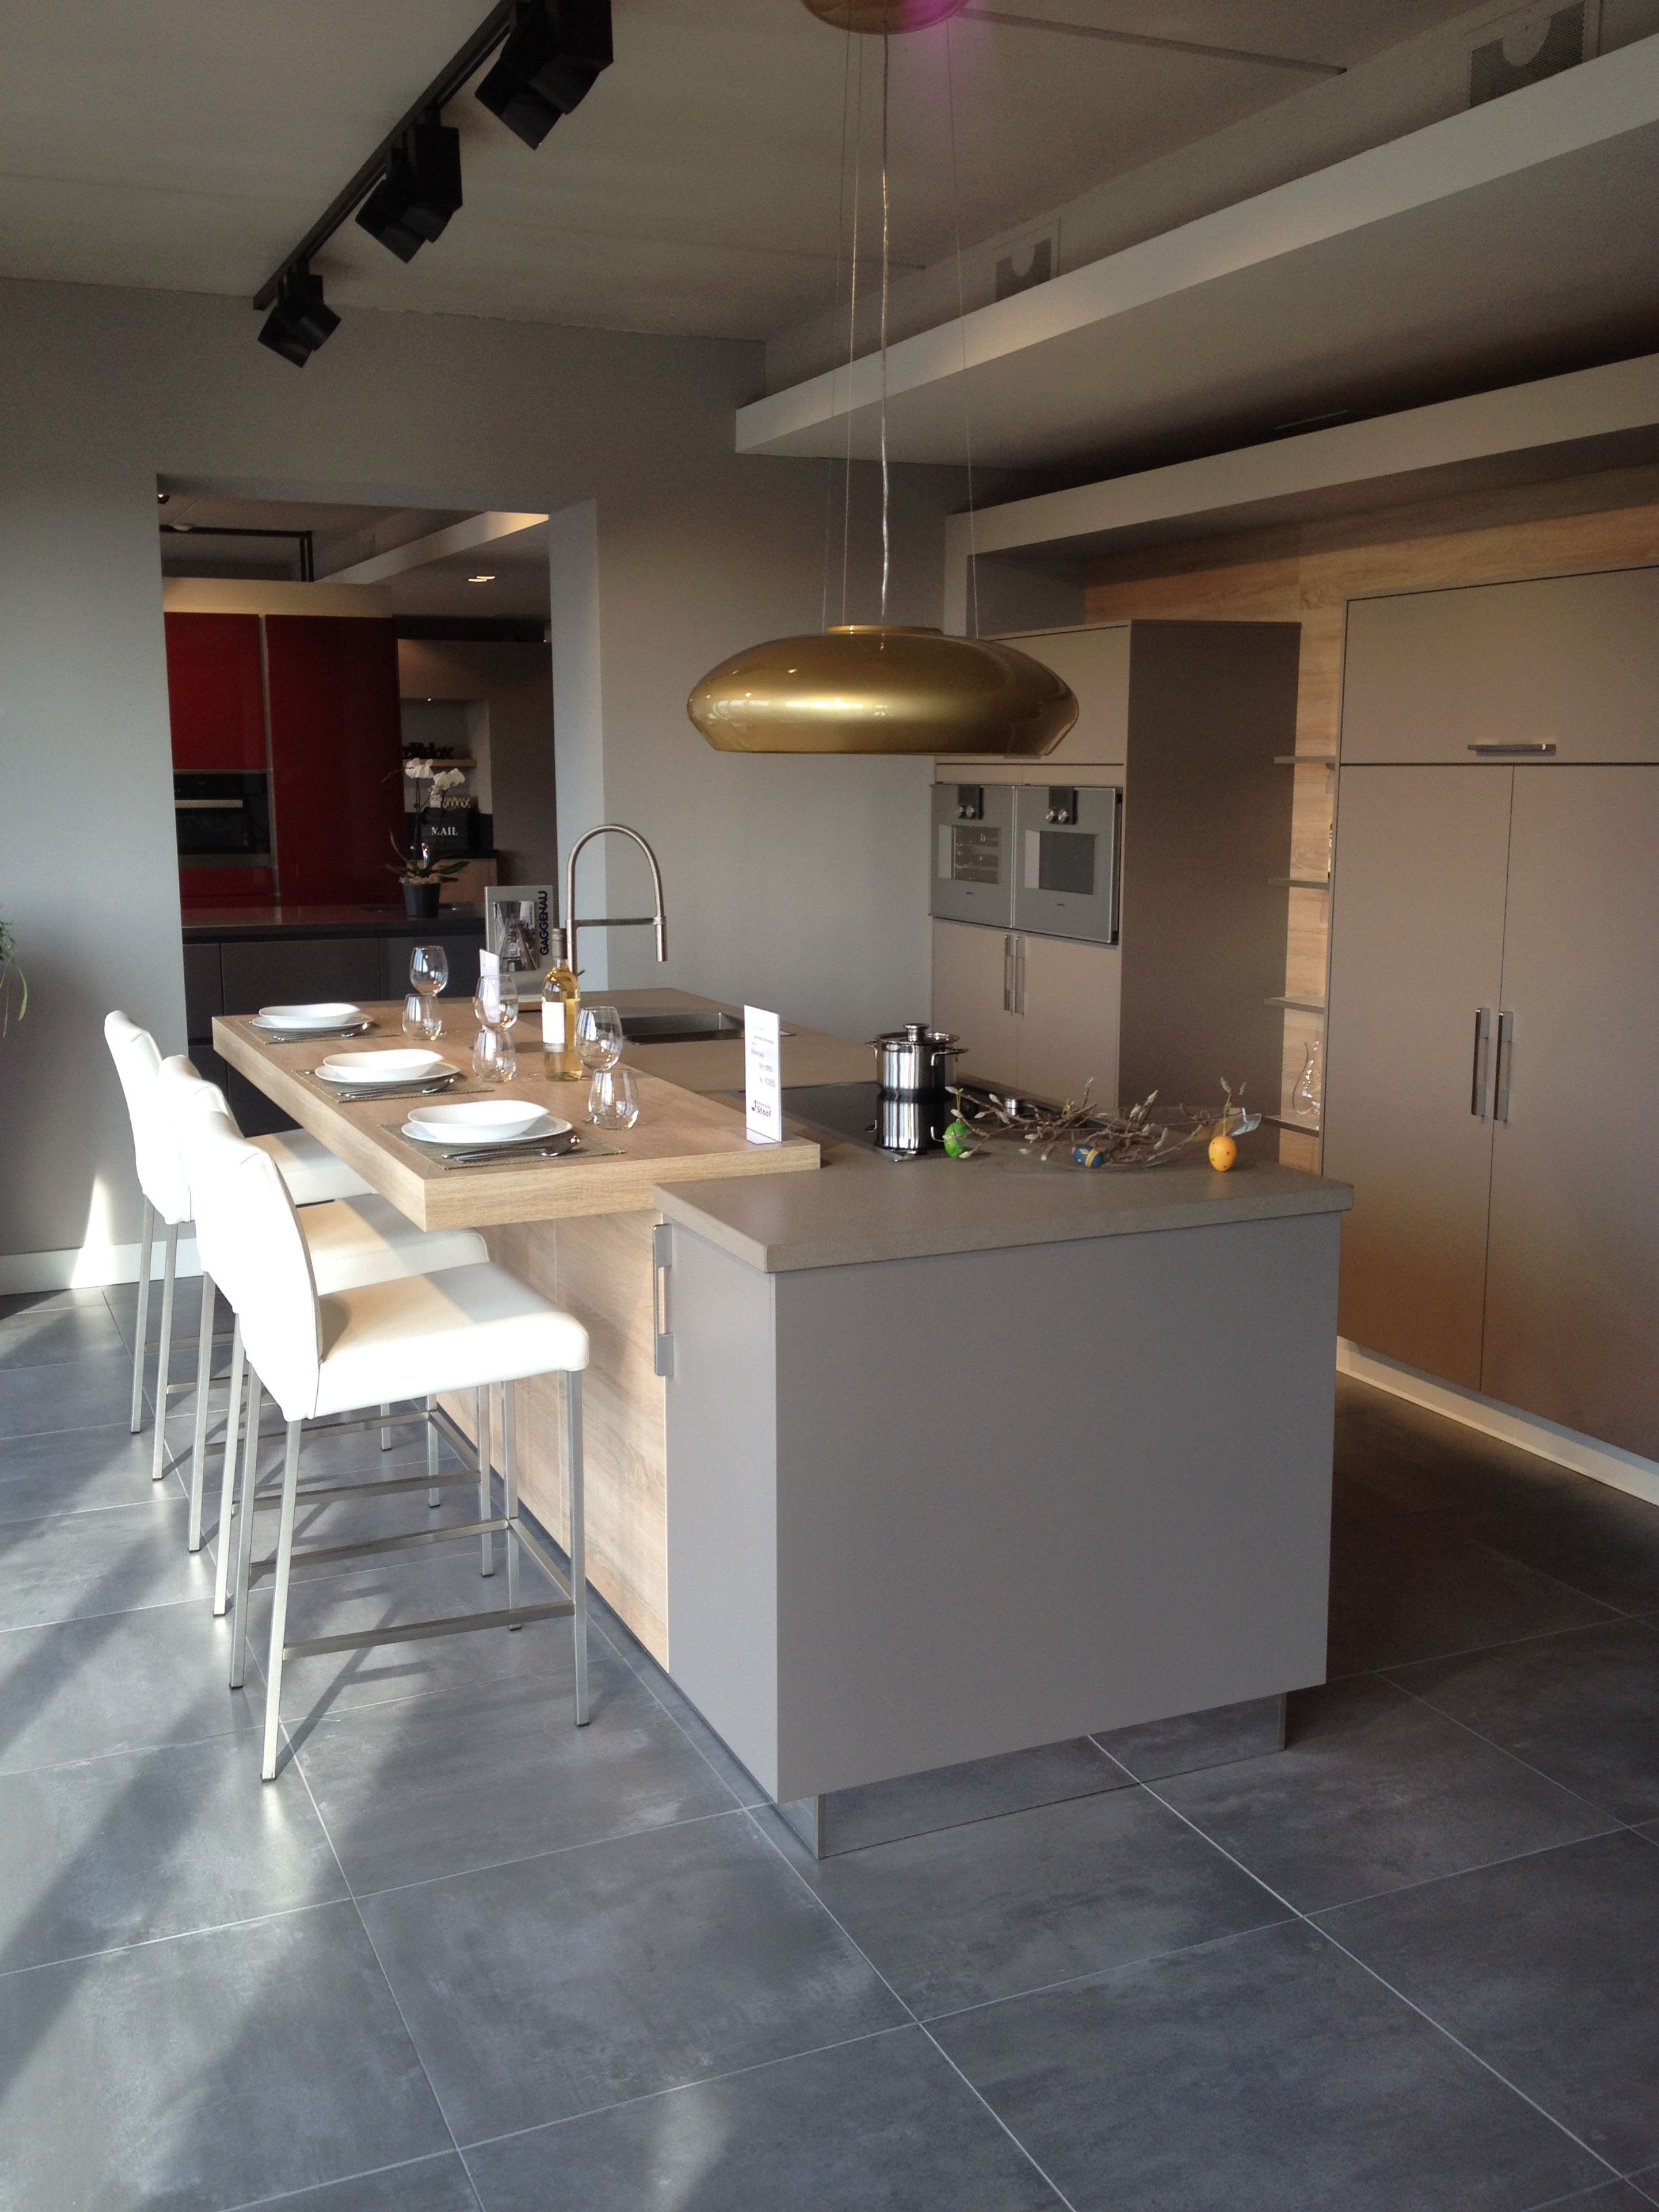 Moderne eiland keuken samen koken kletsen en eten leefkeuken design afzuigkap ga voor - Bar design keuken ...